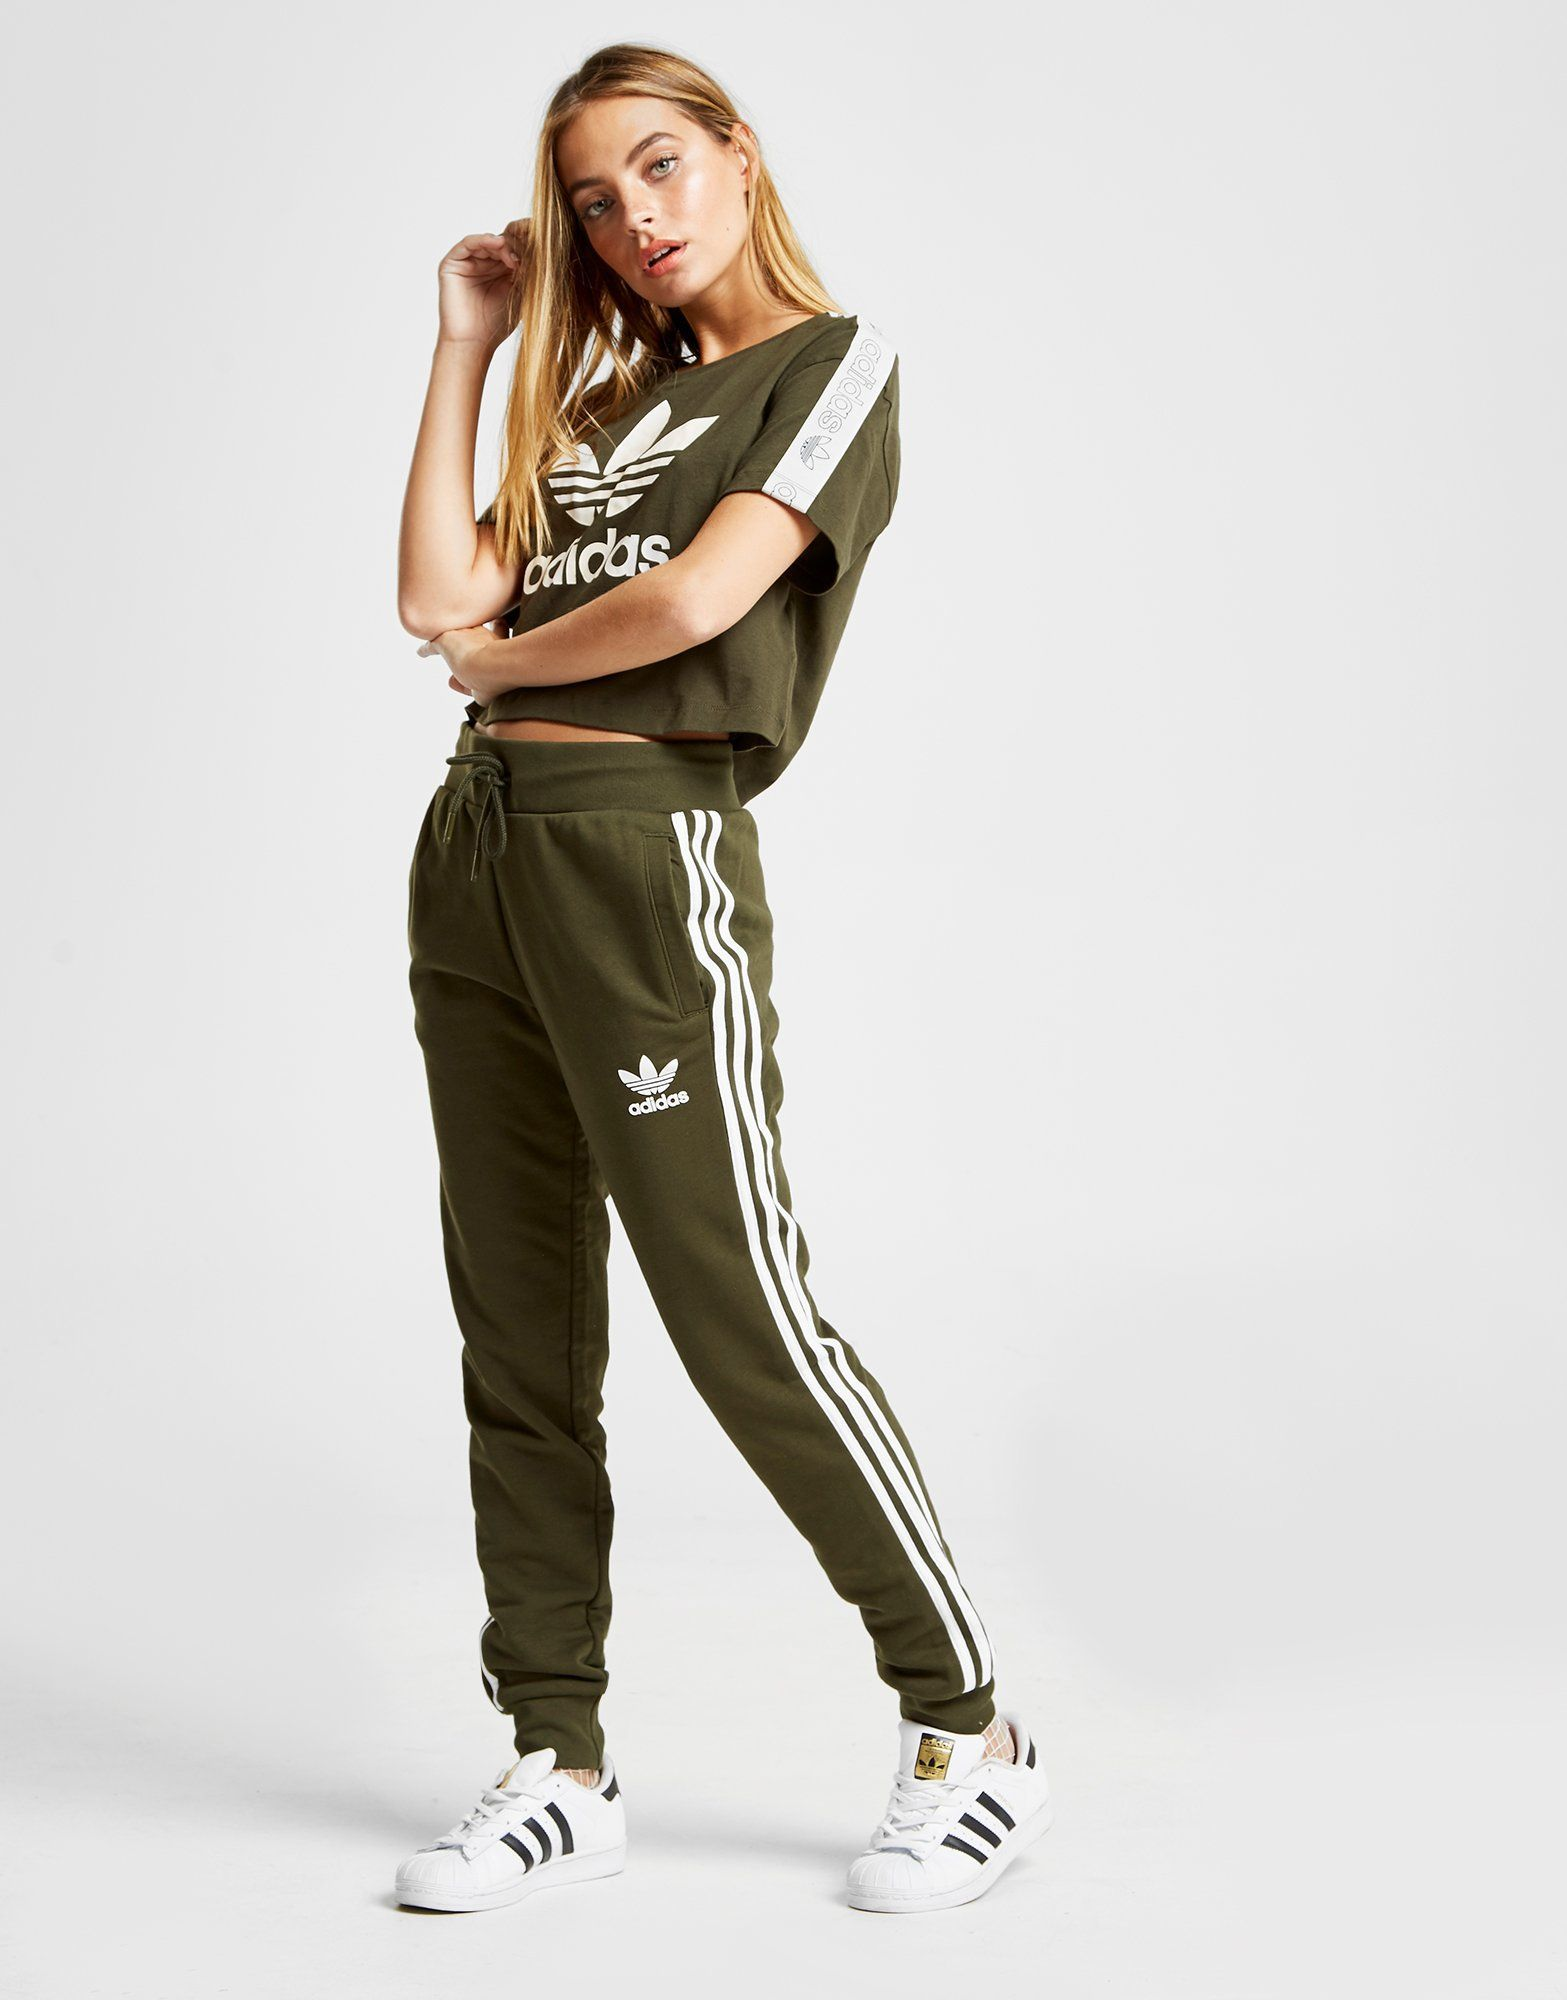 adidas Originals 3Stripes California Fleece Track Pants